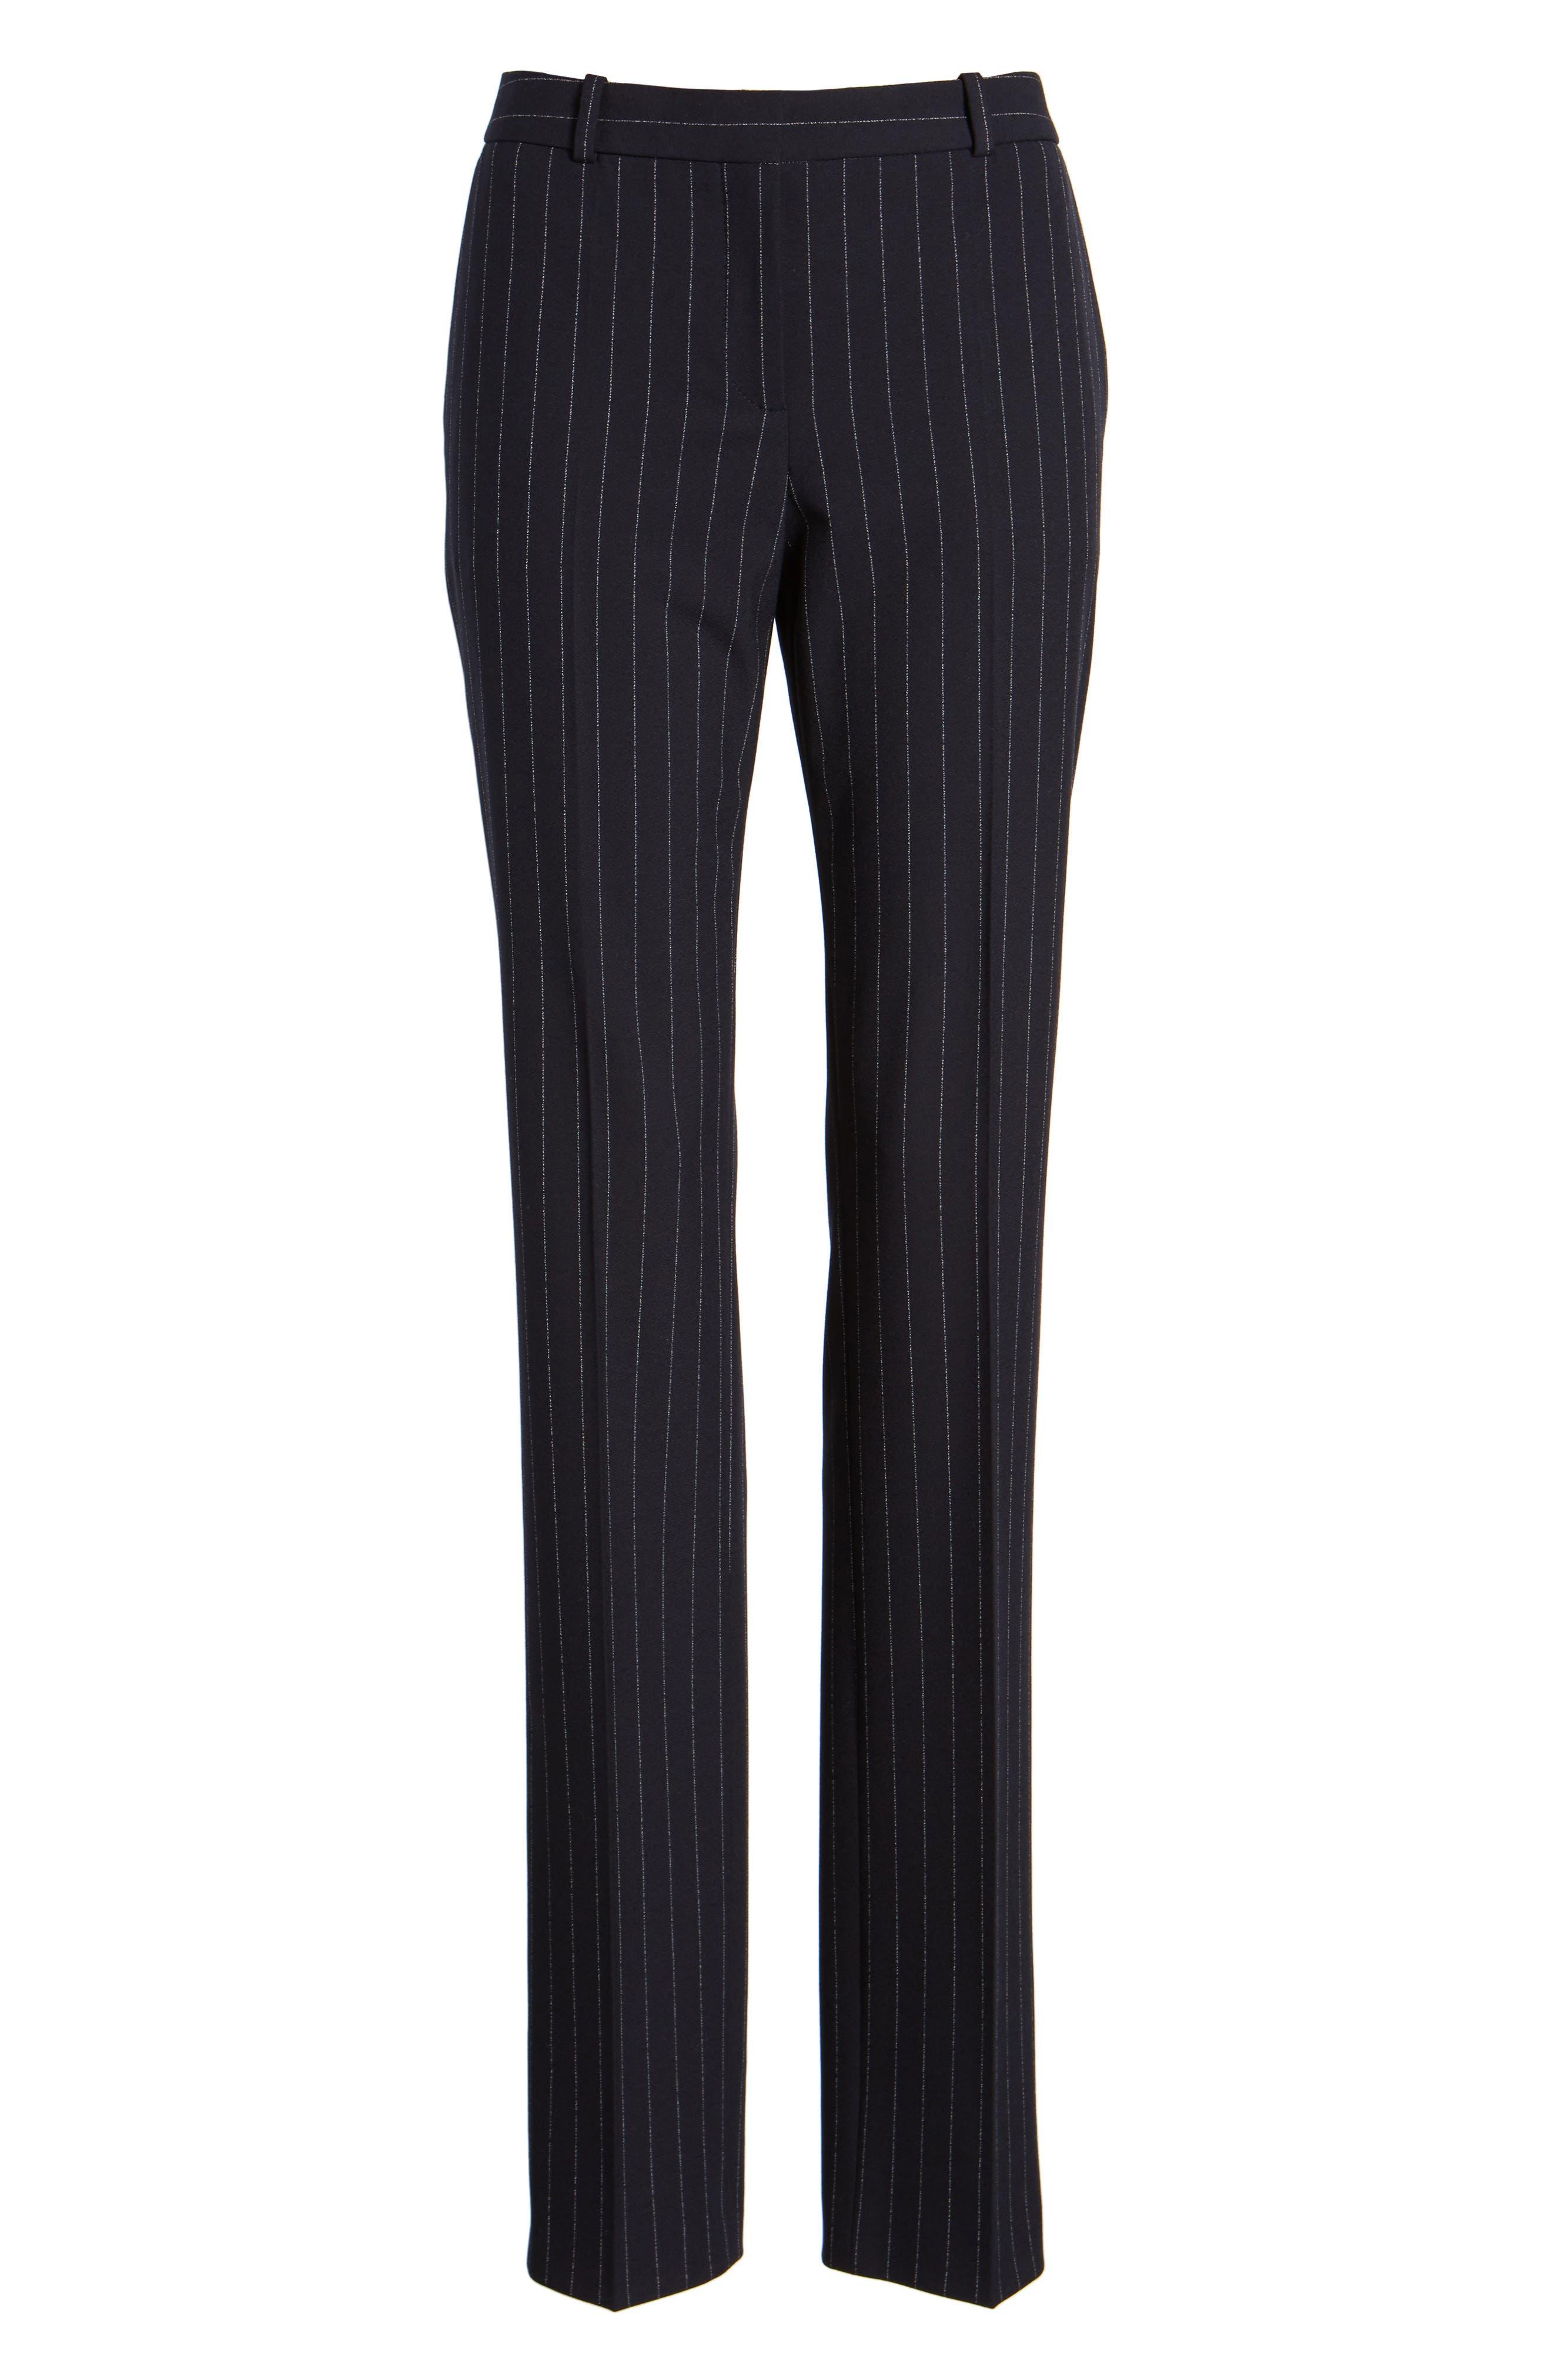 Titana Pinstripe Suit Trousers,                             Alternate thumbnail 8, color,                             Navy Fantasy